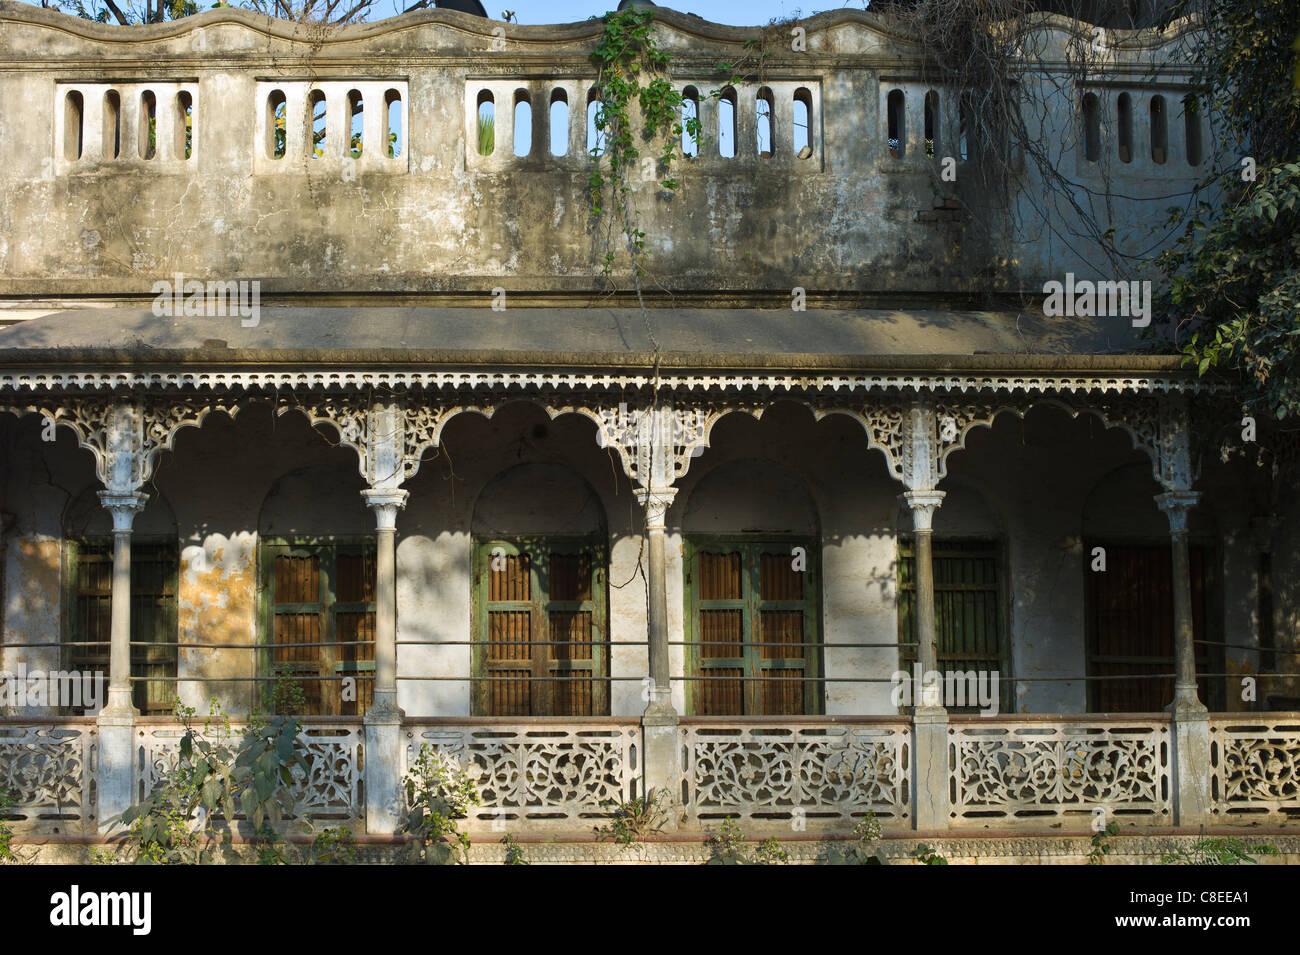 Old Colonial Architecture Period House At Sarnath Near Varanasi